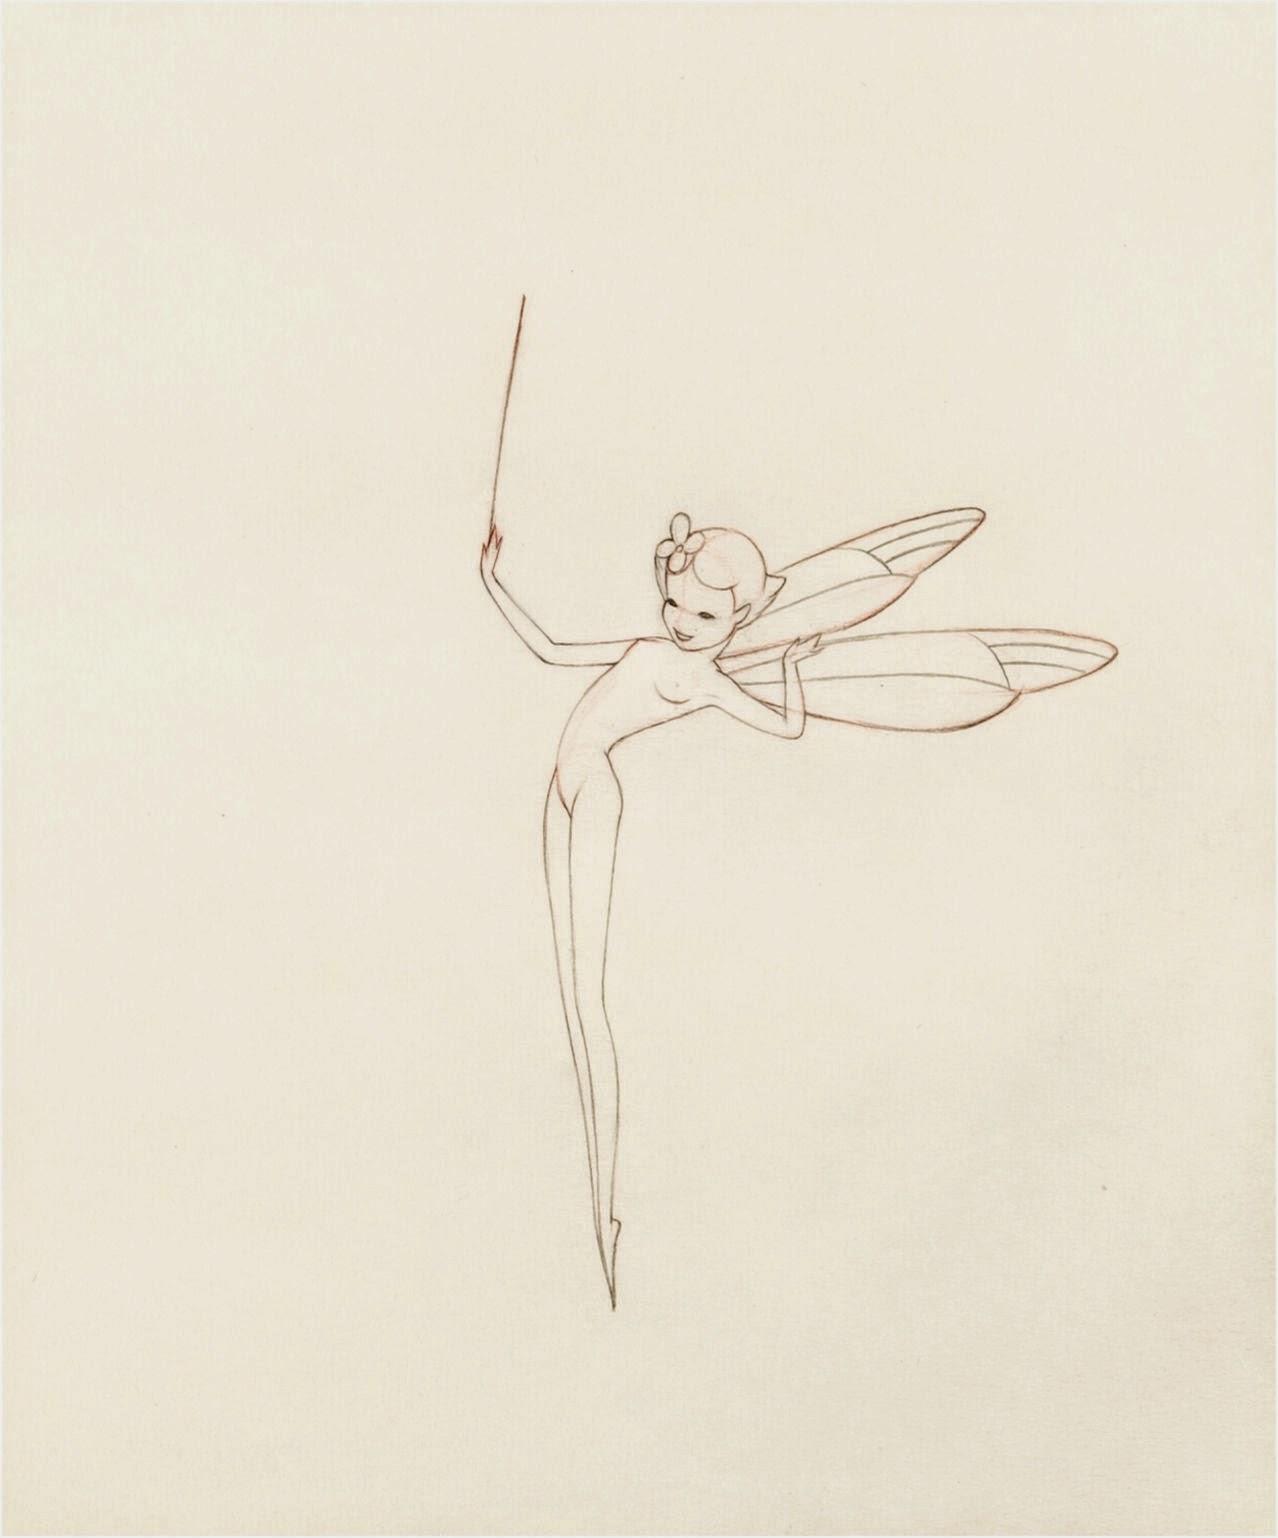 Nude fairy drawings Nude Photos 1